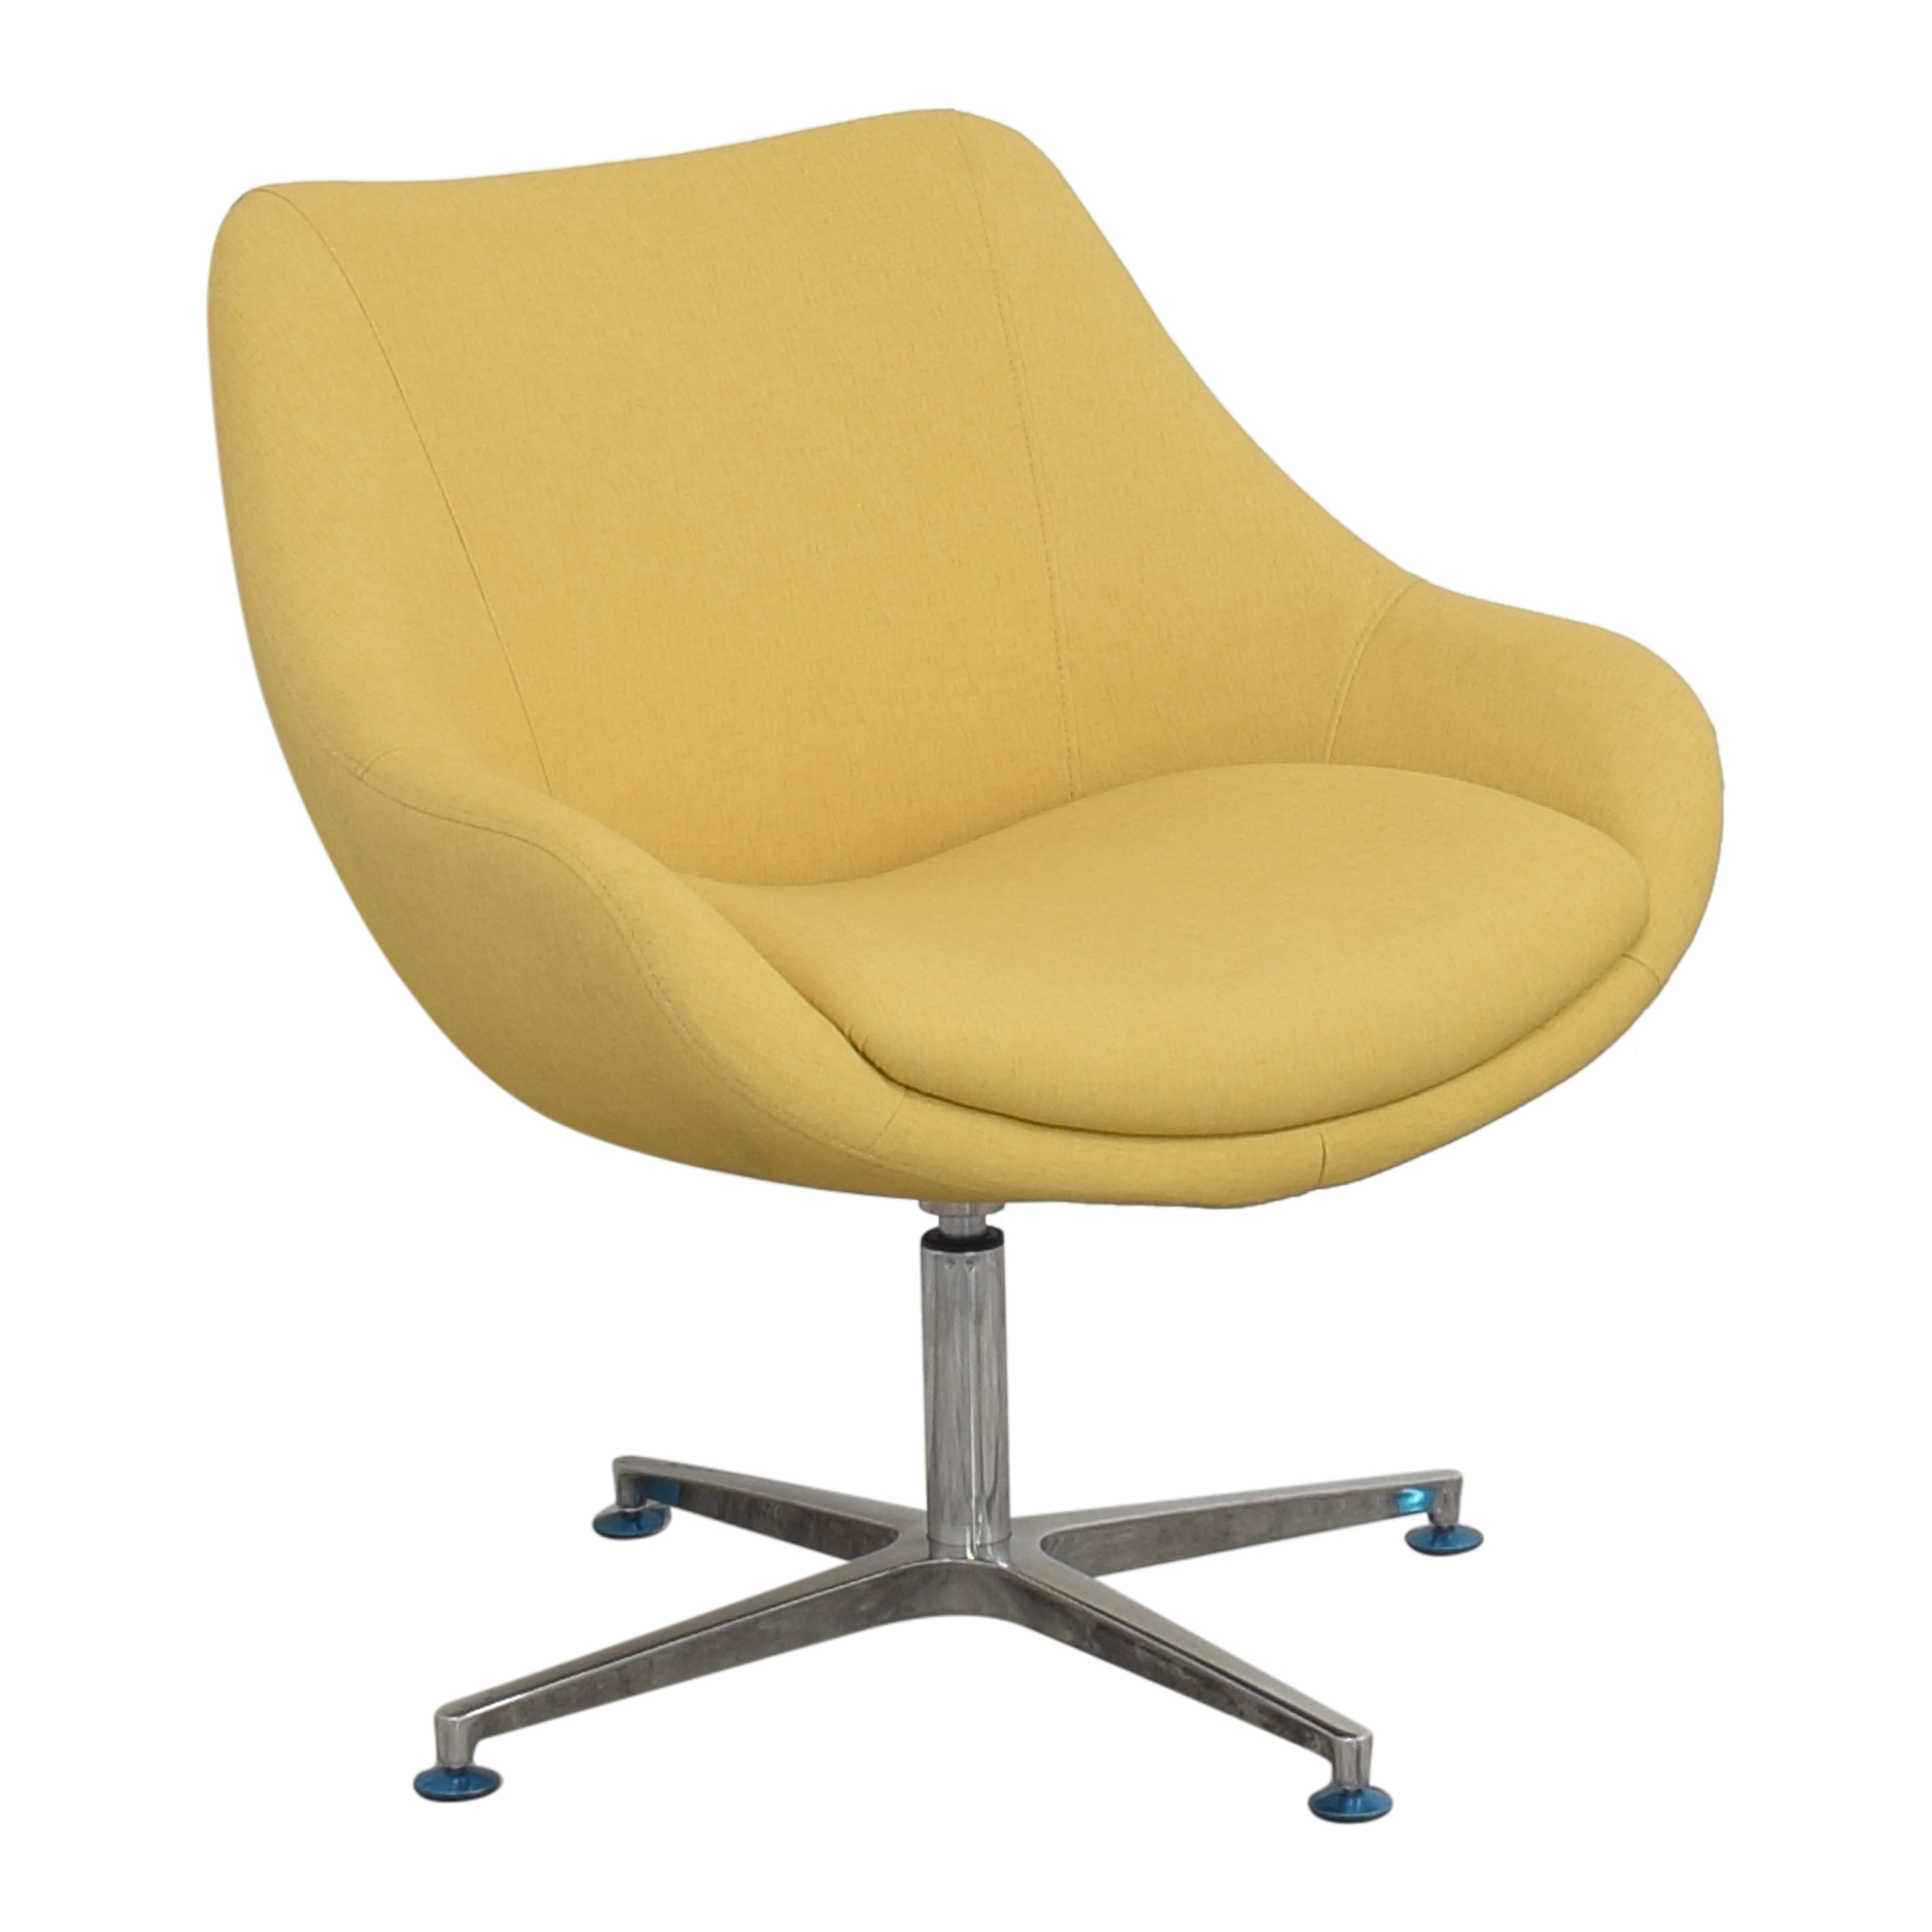 buy Kimball Kimball Bloom Swivel Lounge Chair online